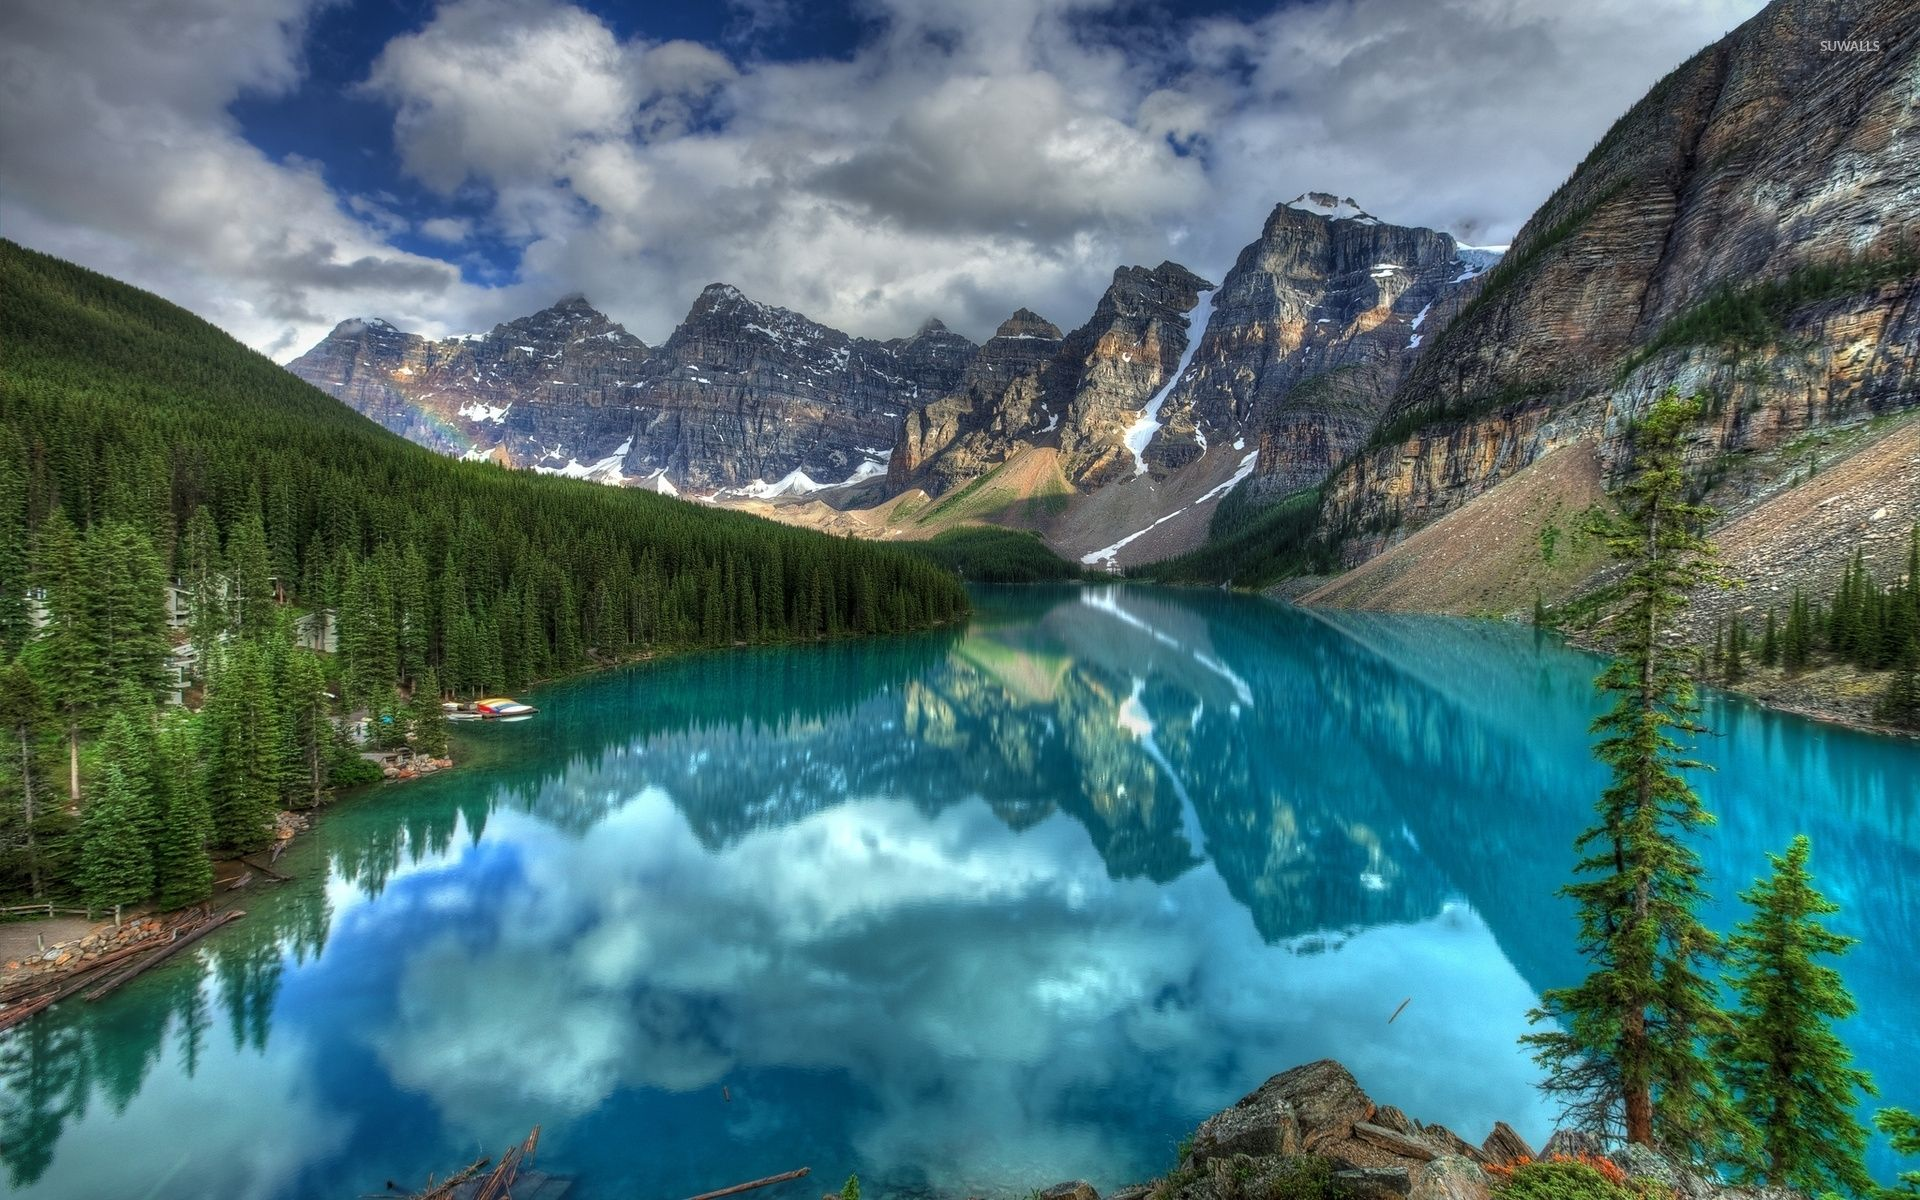 Banff National Park Wallpaper Turquoise Lake In Banff